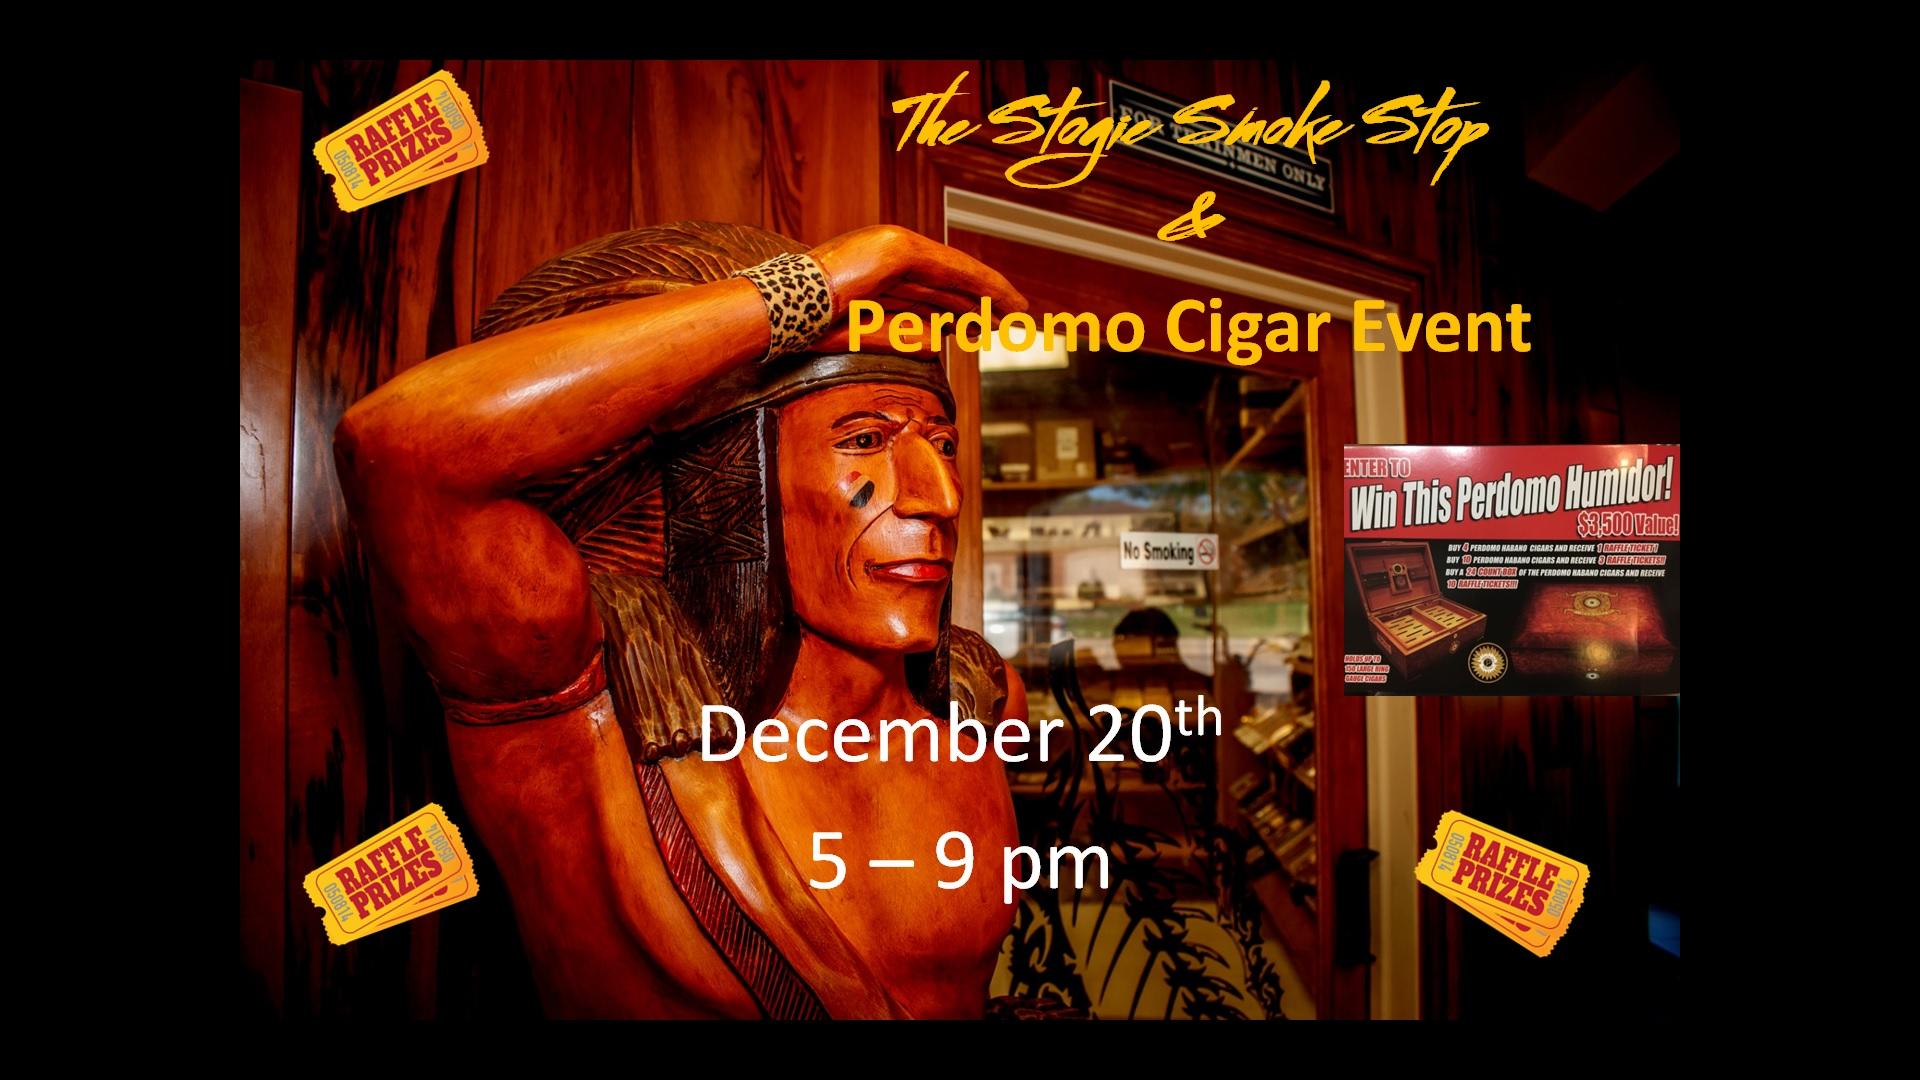 Perdomo Cigar Event & Humidor Give Away